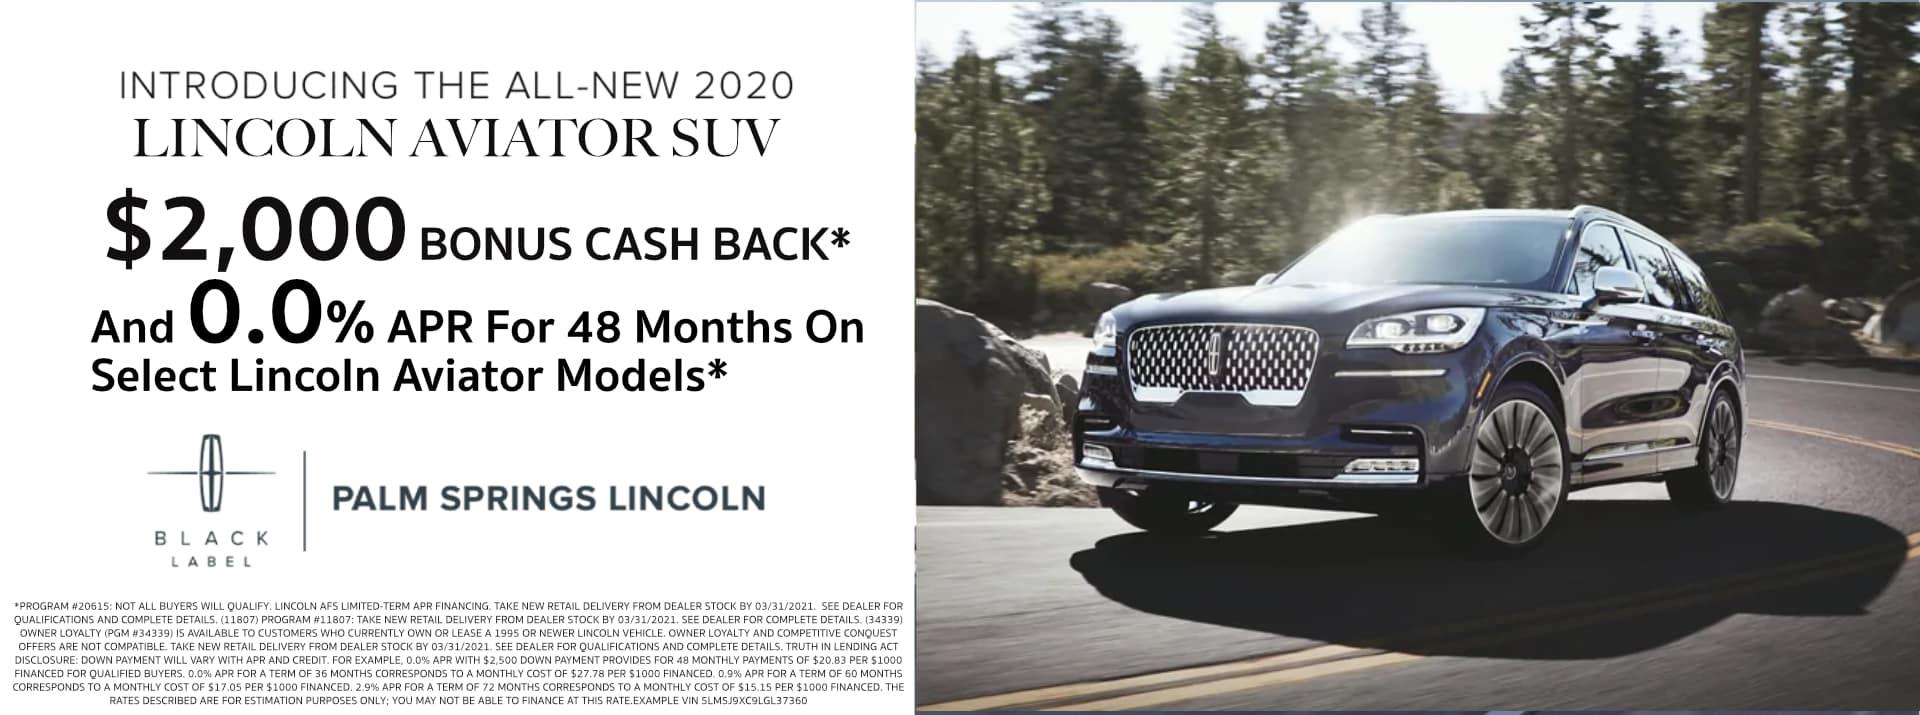 February 2021_2020_Lincoln_Aviator_1920x715